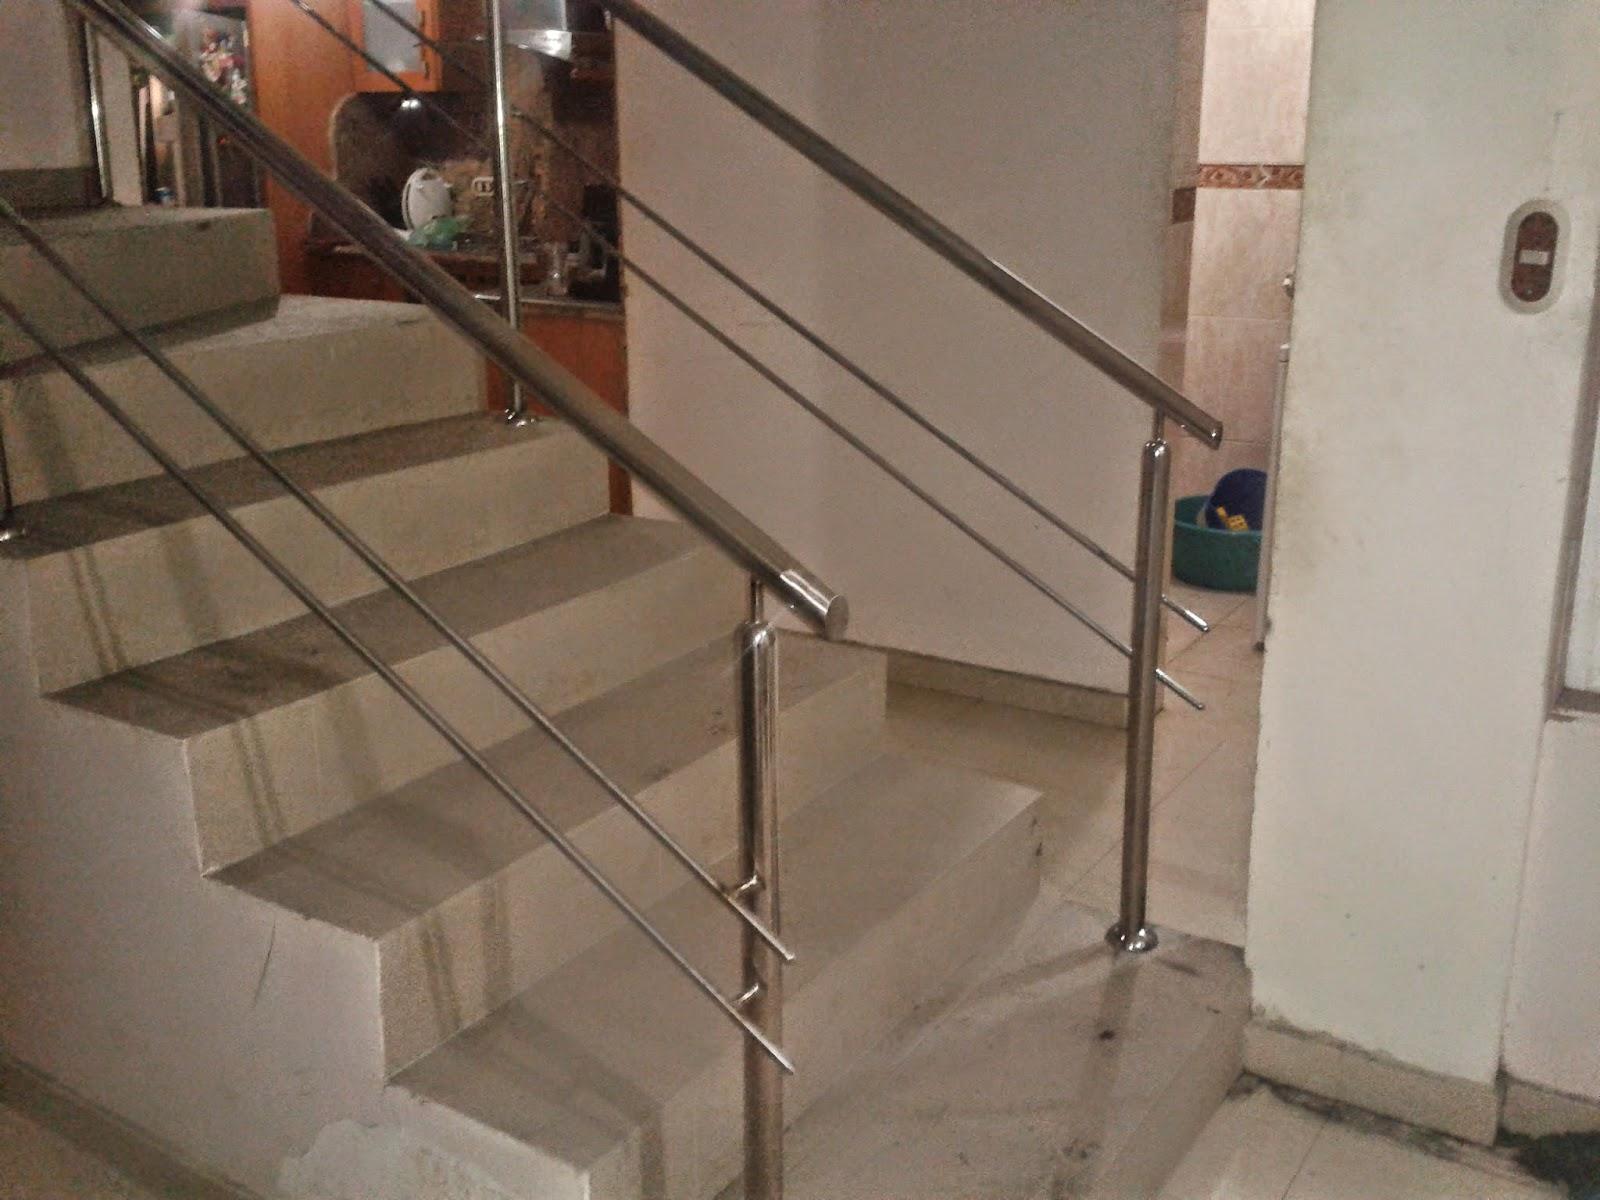 Barandas de escaleras metalicas escaleras de madera for Barandas de escalera